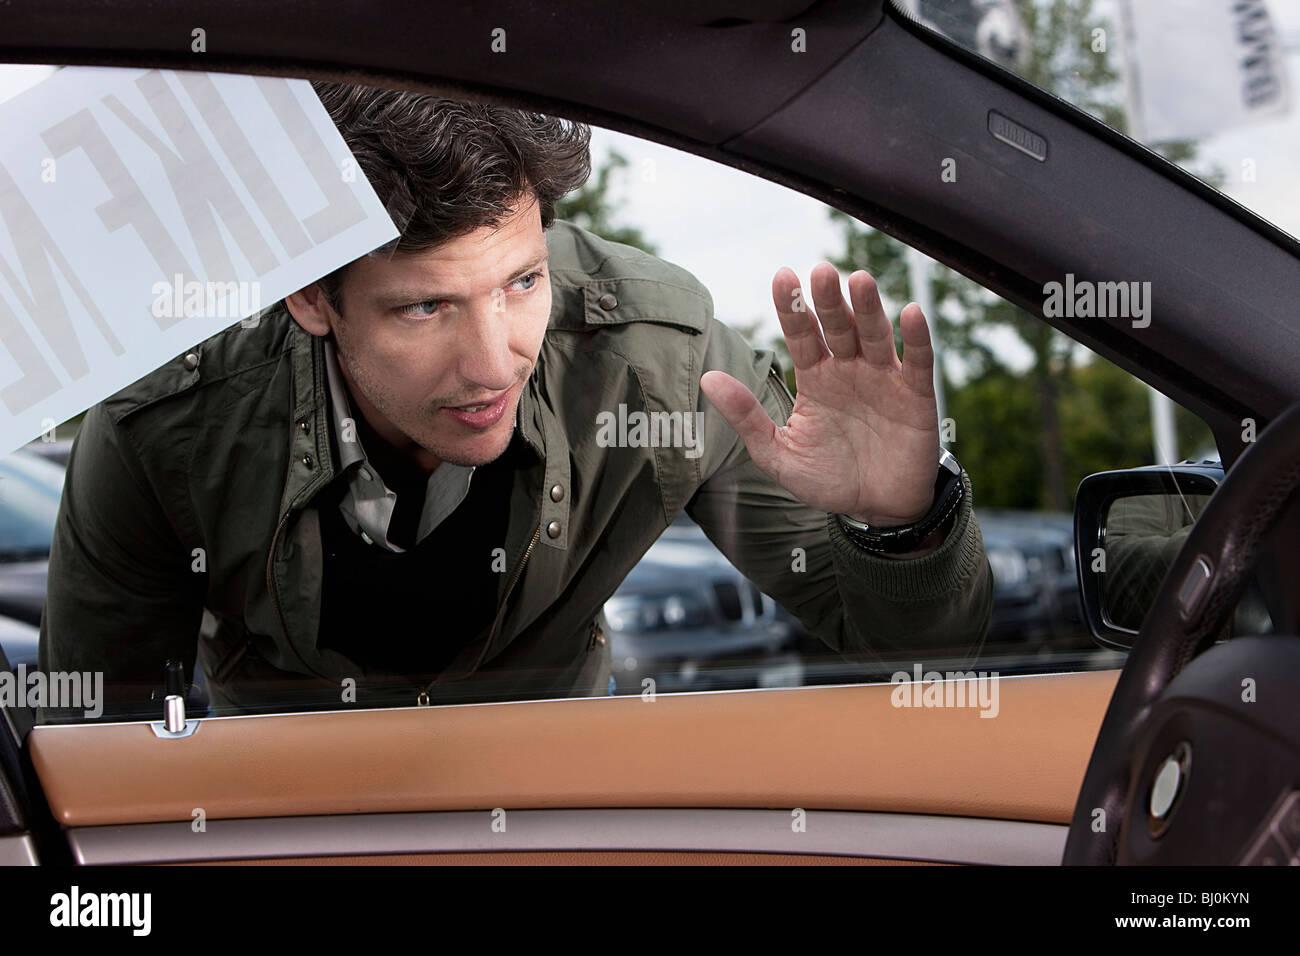 portrait of man looking through car window - Stock Image